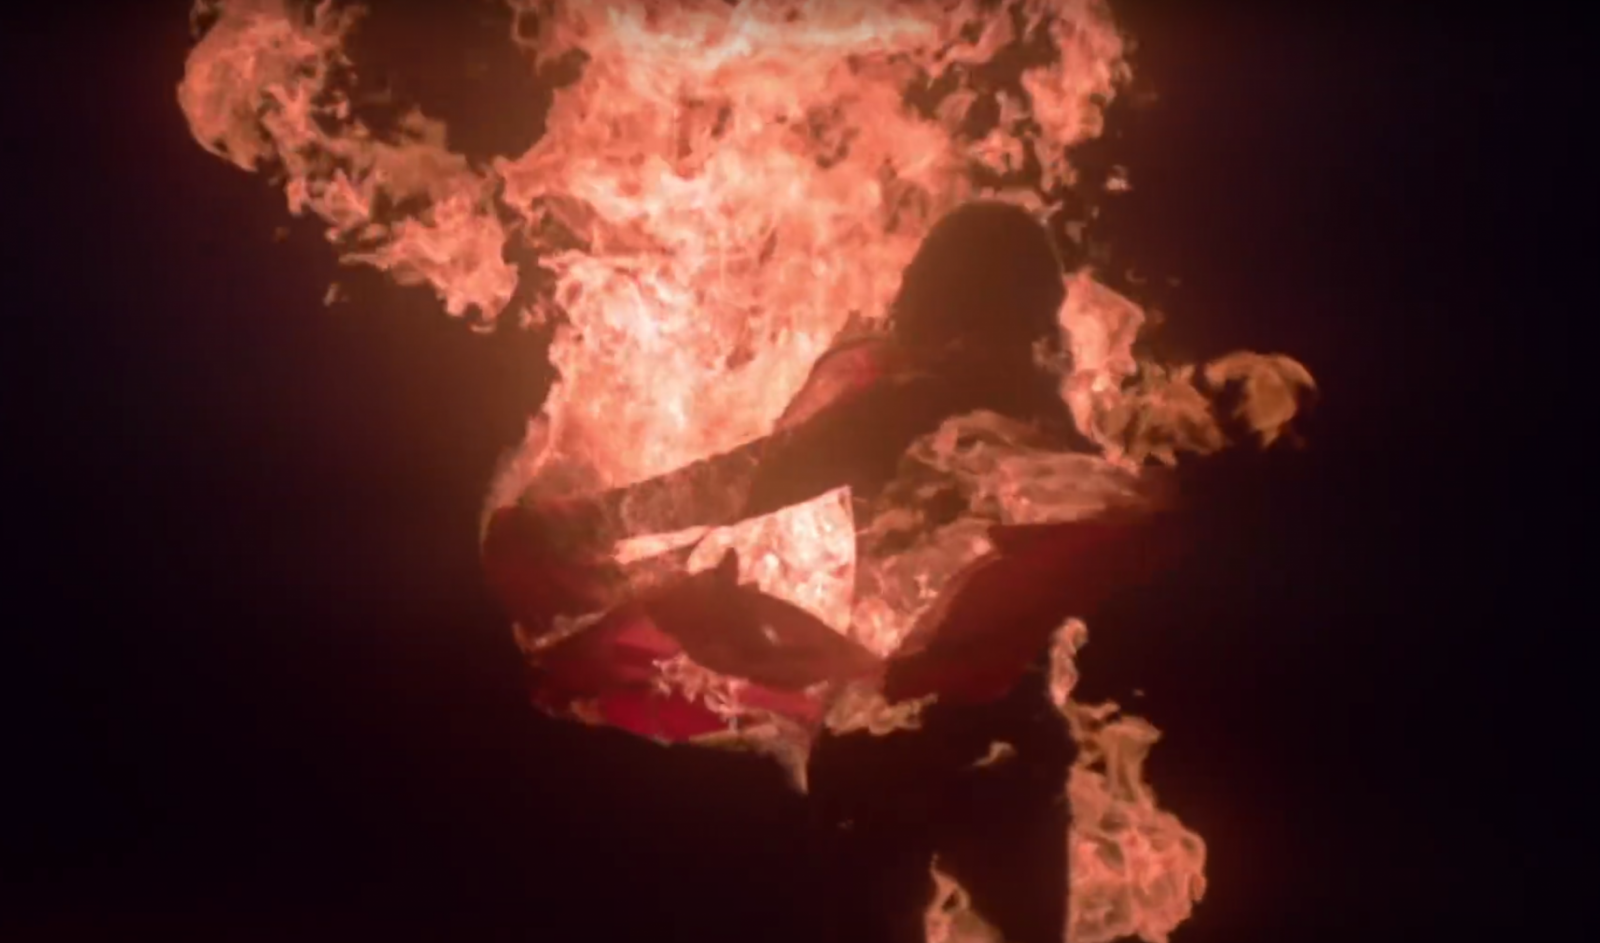 mg action, body-burn, feuerstunt deutschland, naked skin burn, body burn berlin,